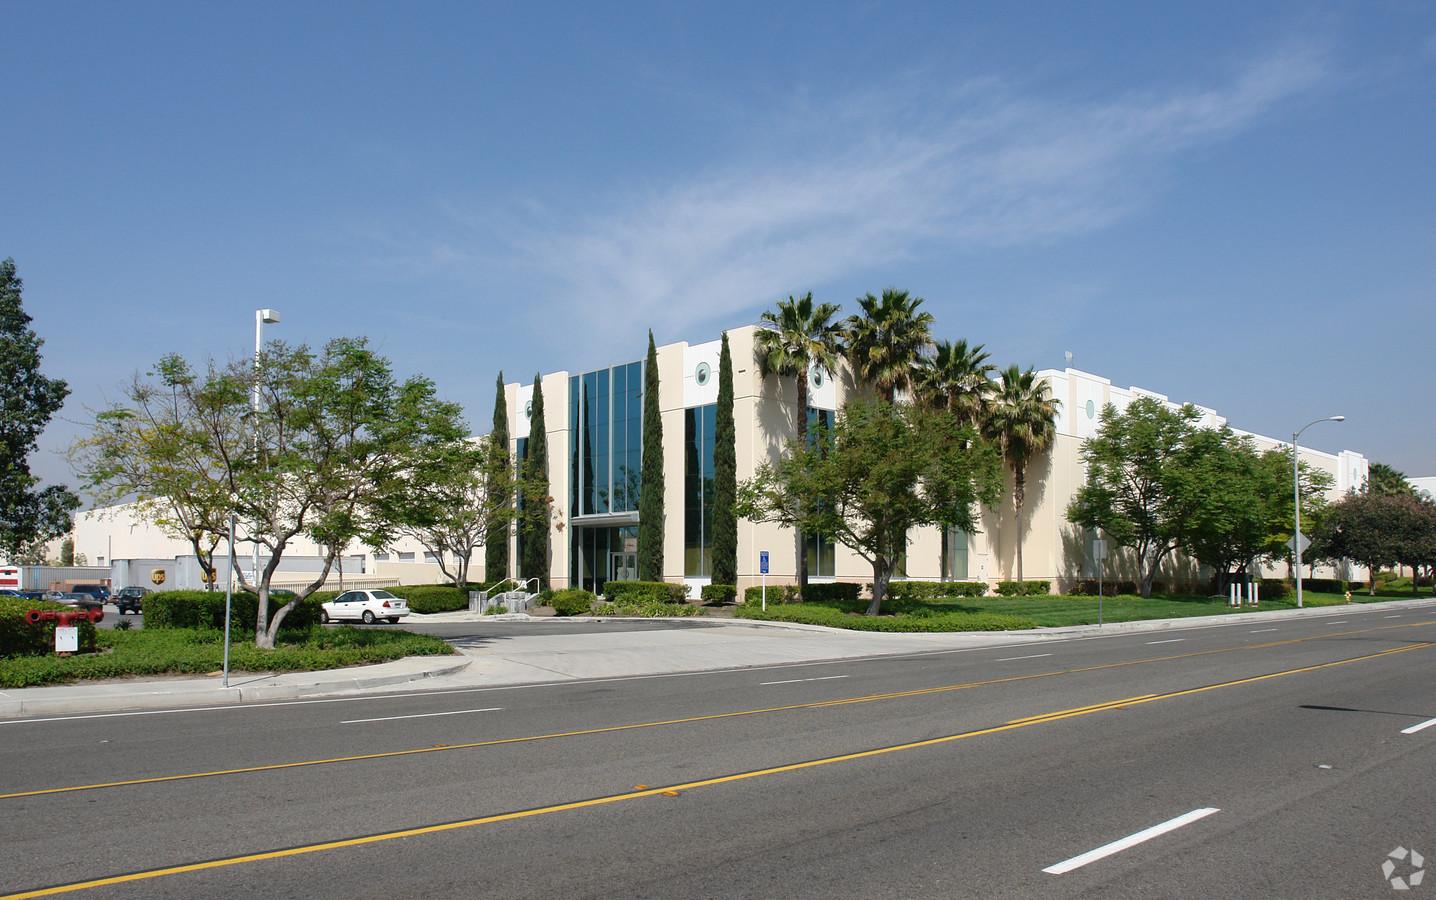 Cubework-Chino, Los Angeles